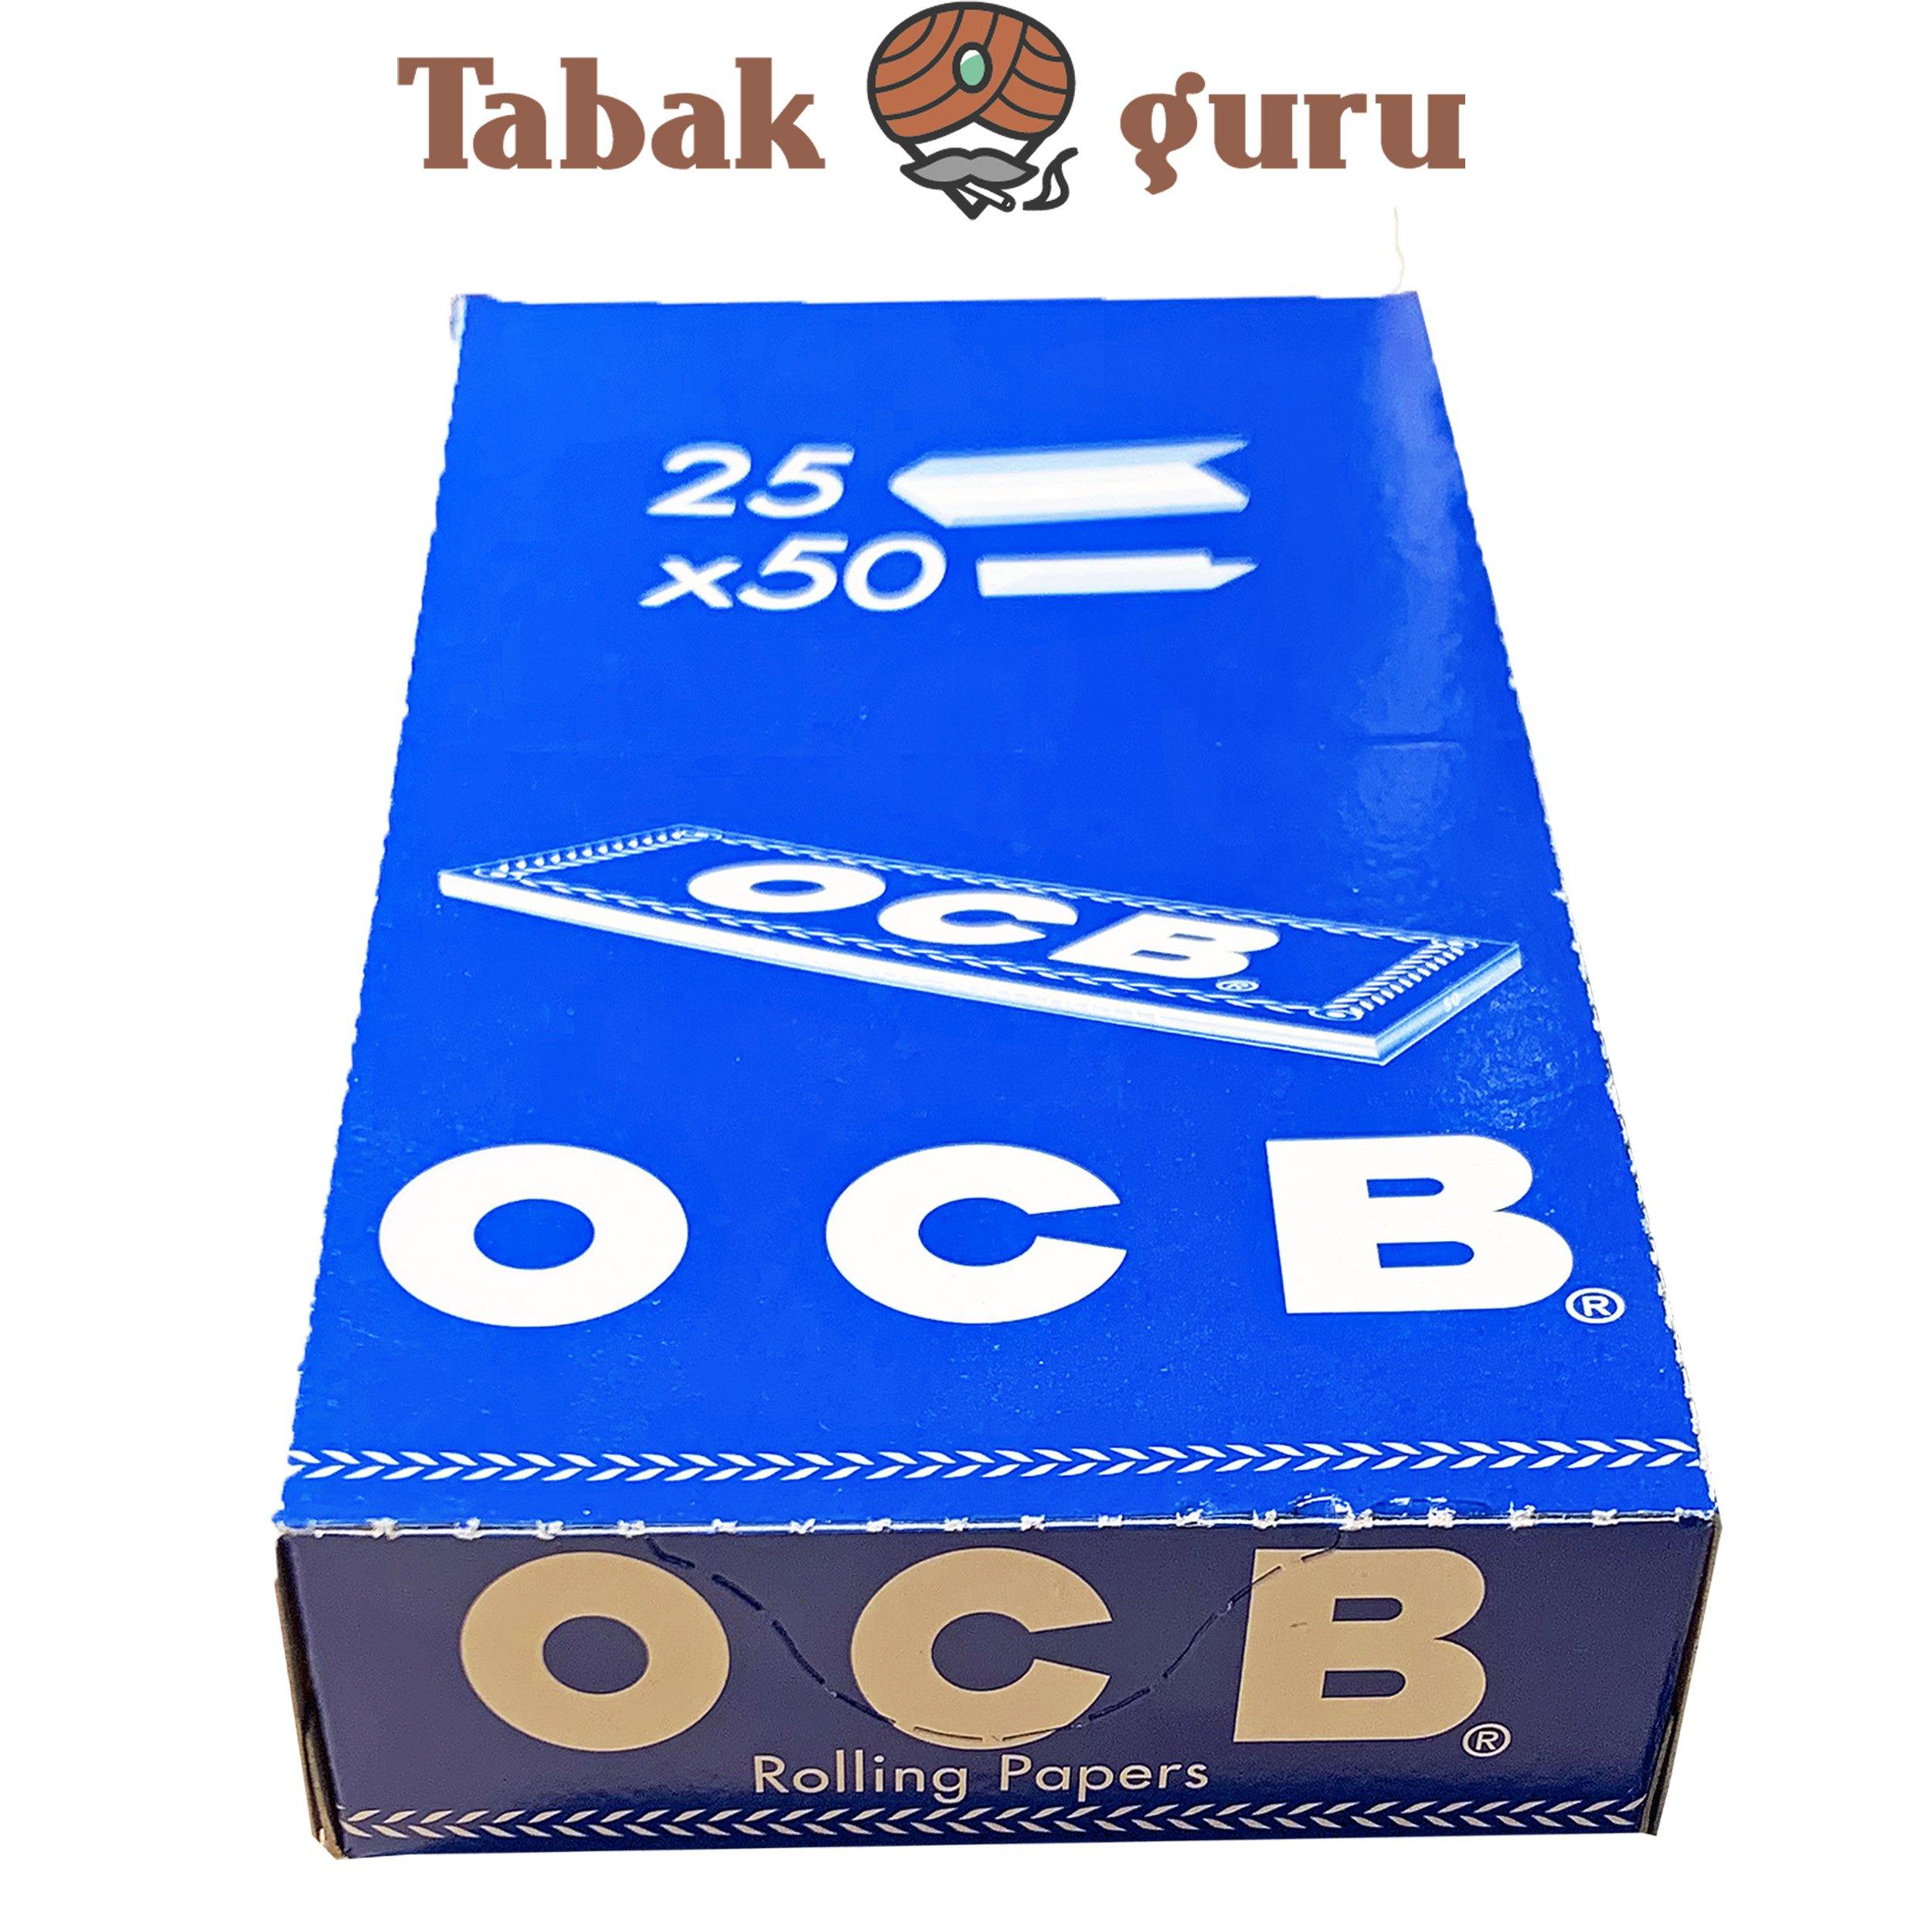 OCB Blau - 25 Hefte á 50 Blatt